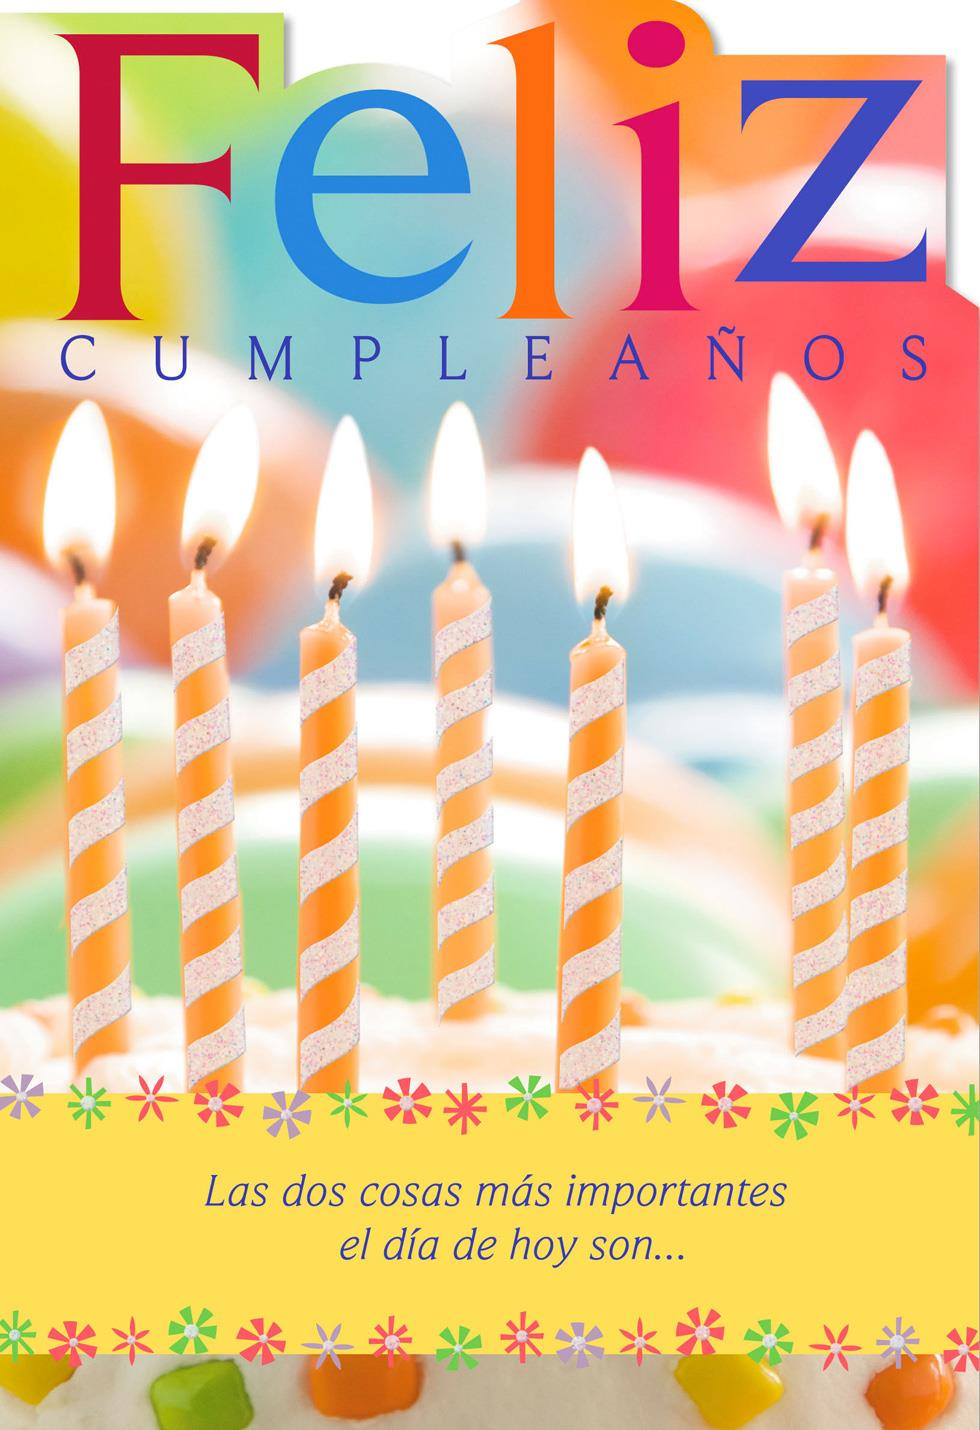 Candles Spanish Language Religious Birthday Card Greeting Cards Hallmark